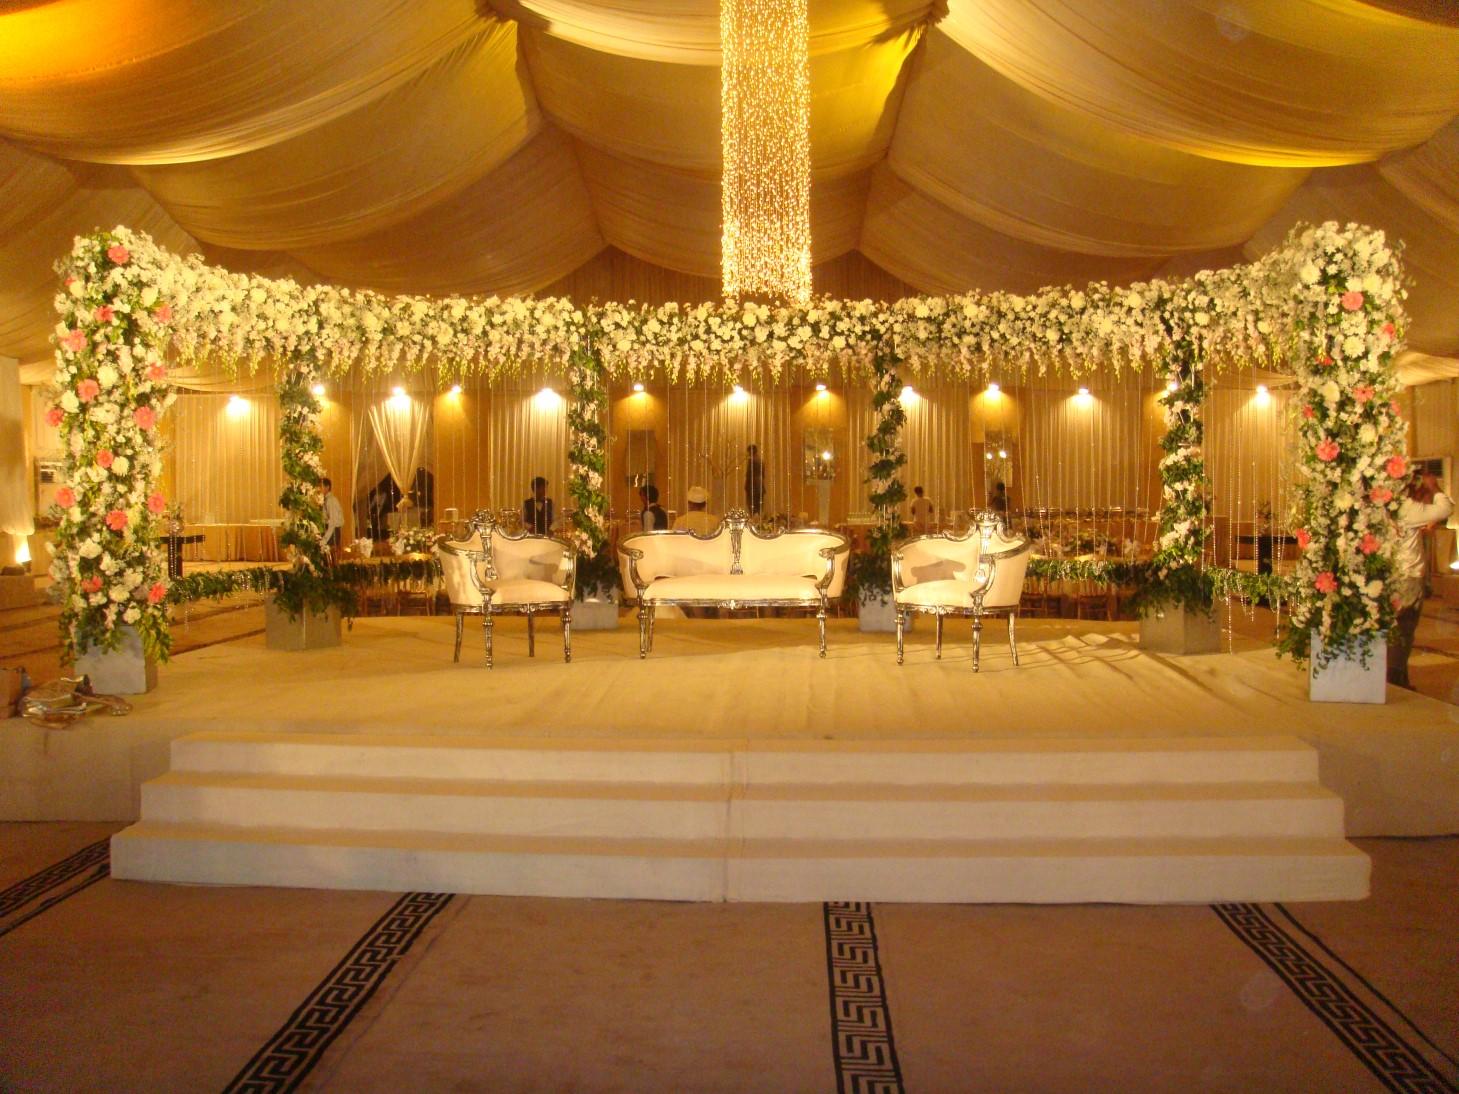 Stage decoration ideas for wedding elitflat about marriage marriage decoration photos 2013 marriage junglespirit Images